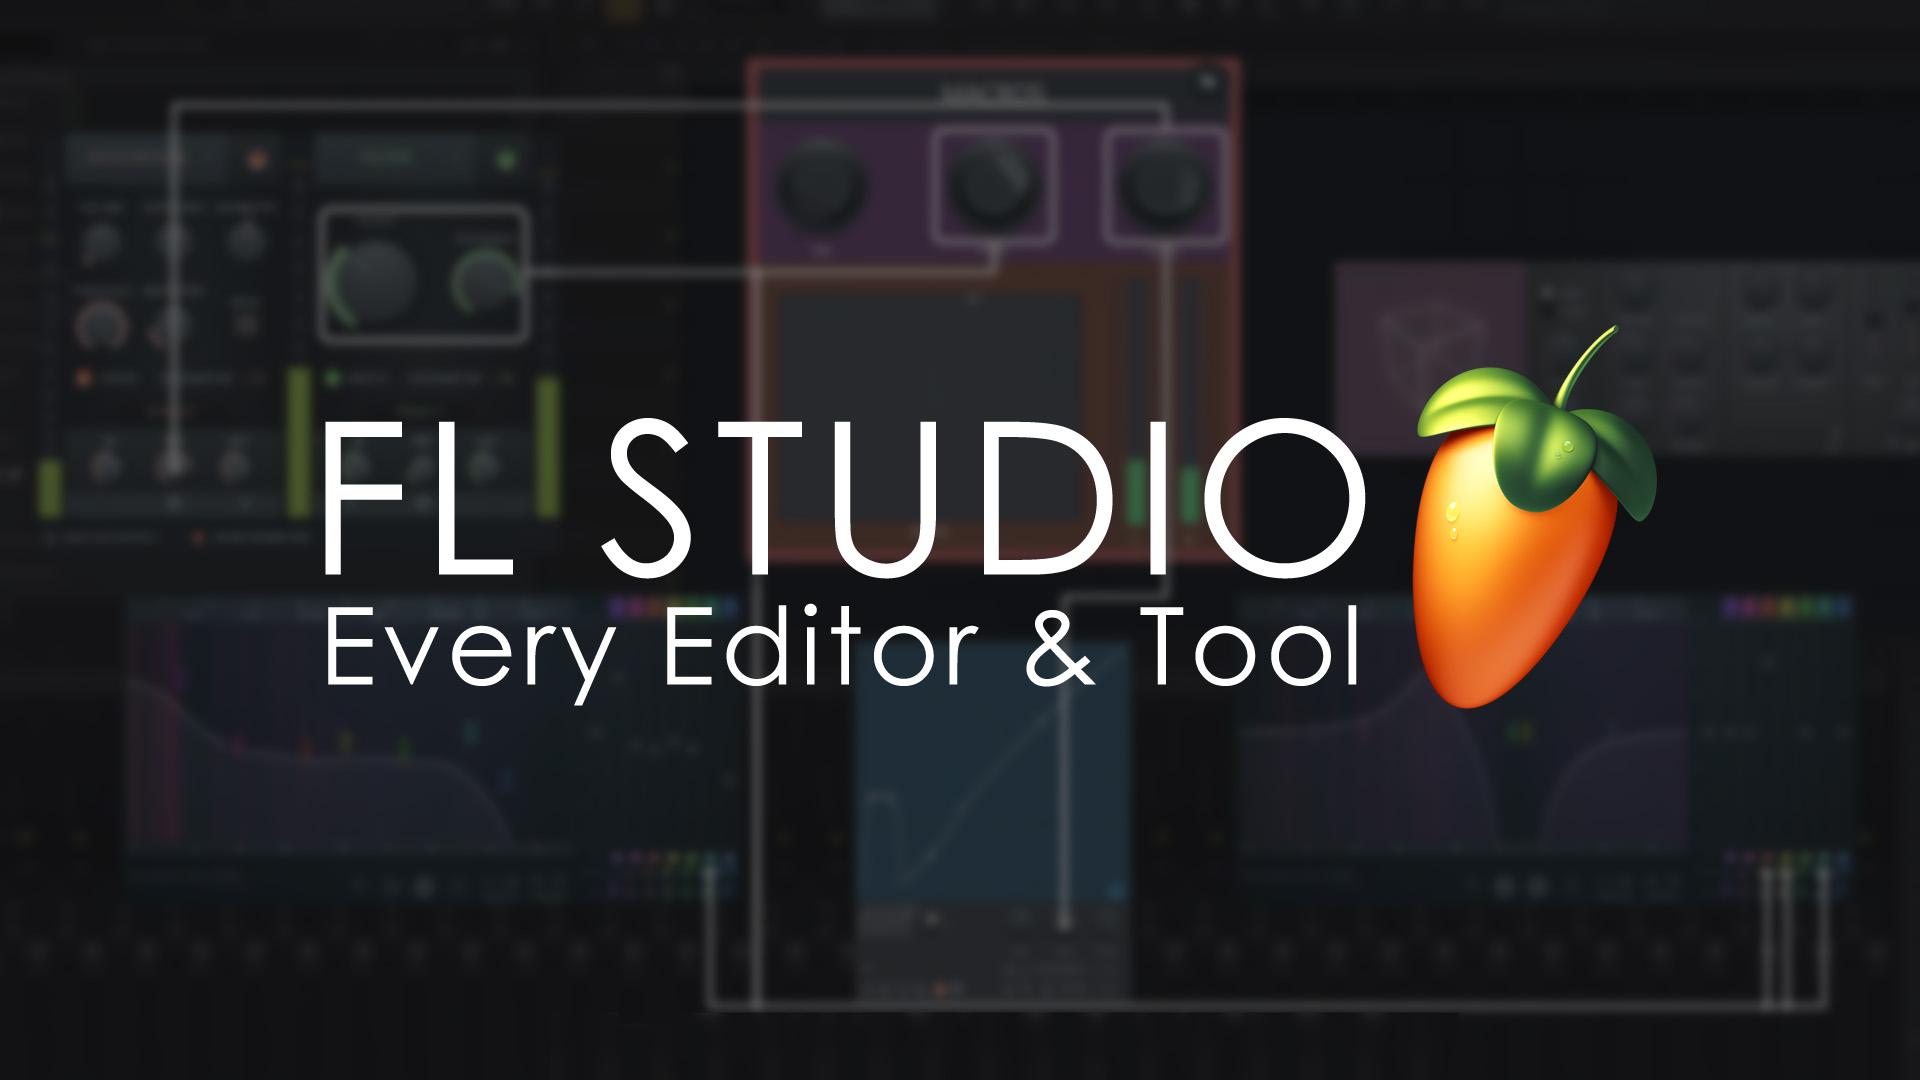 FL STUDIO | Every Audio Editor & Tool | FL Studio